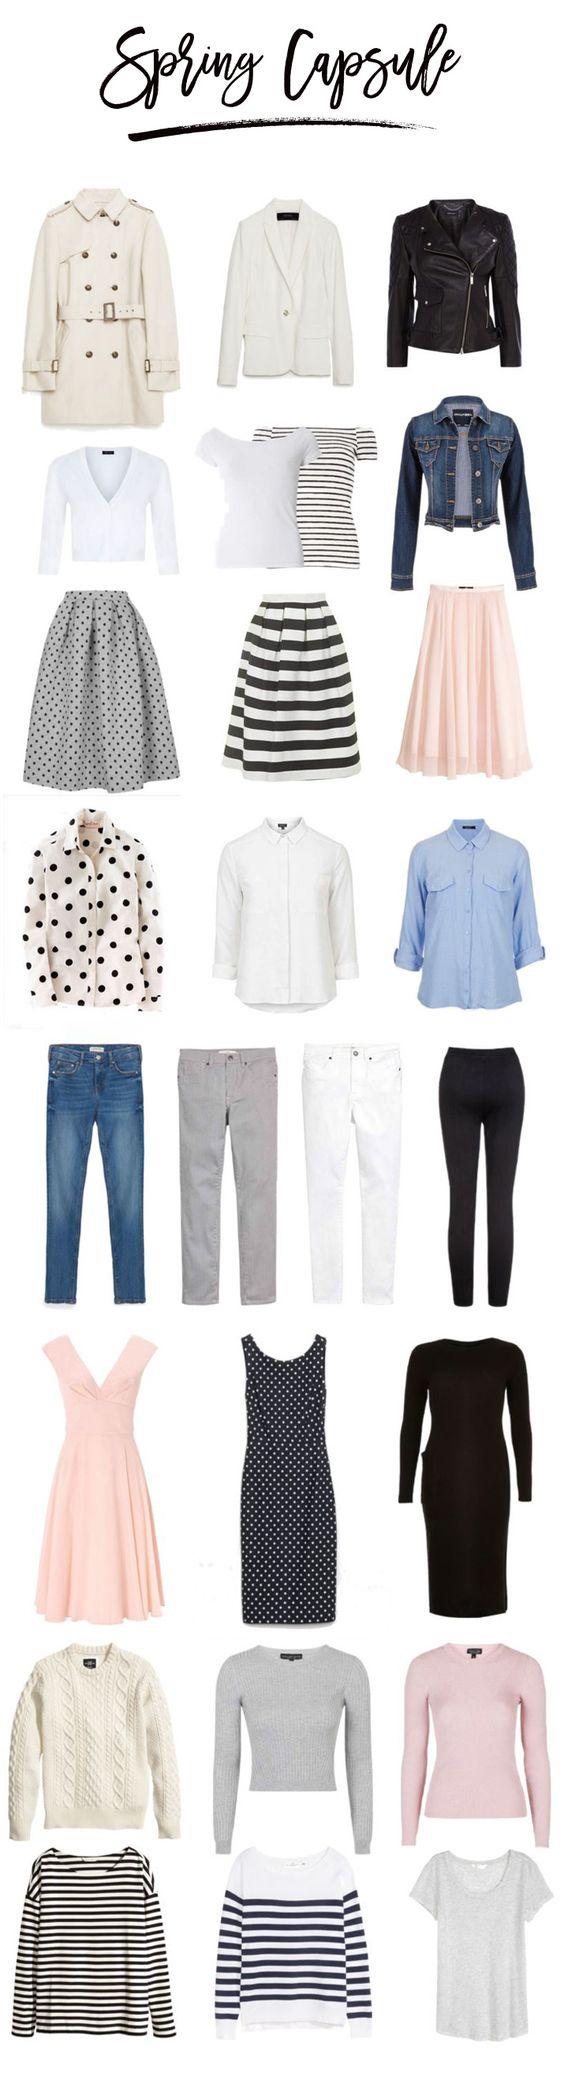 minimalist capsule wardrobe spring